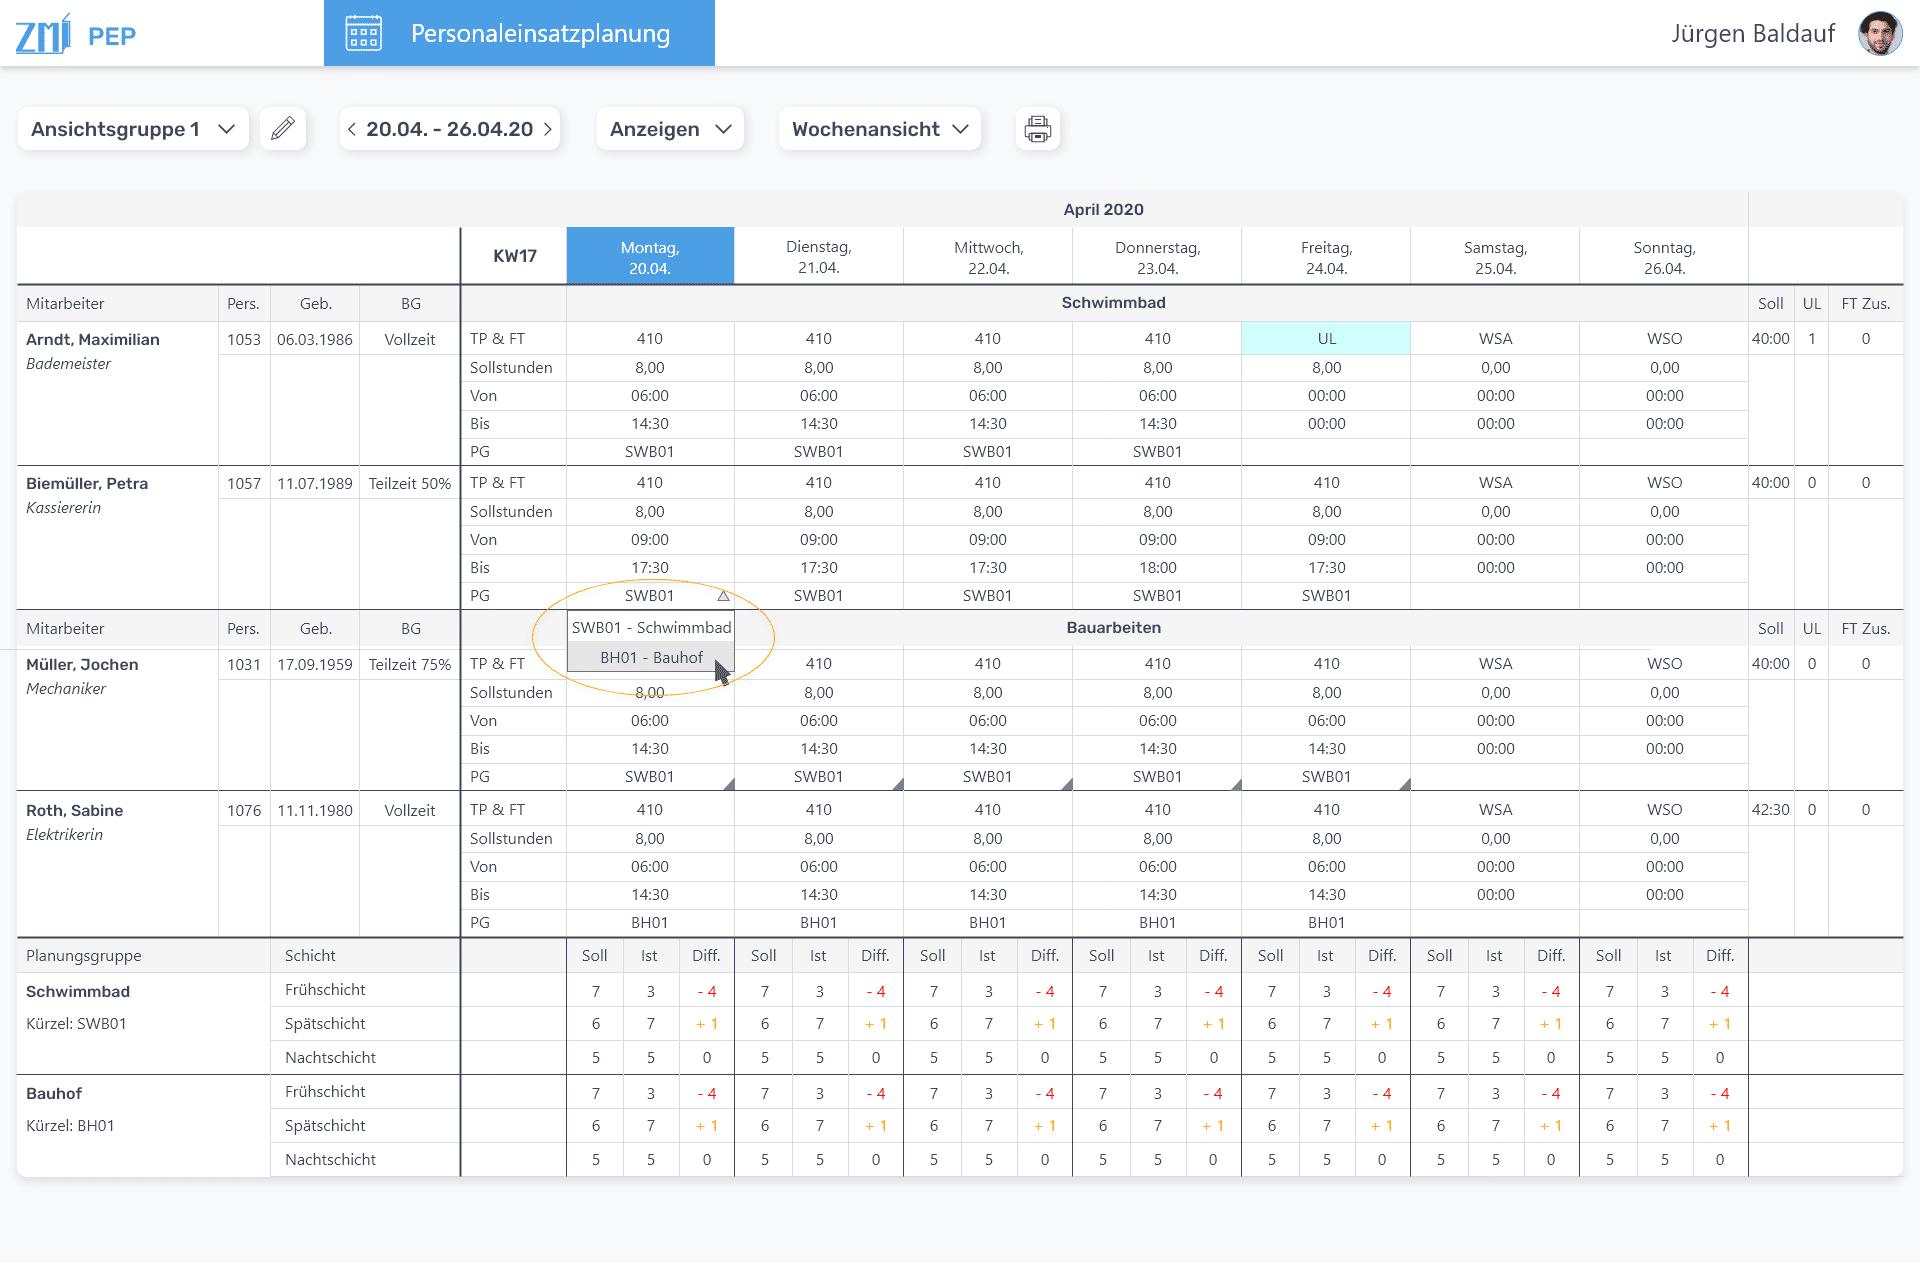 ZMI Personaleinsatzplanung Screenshot